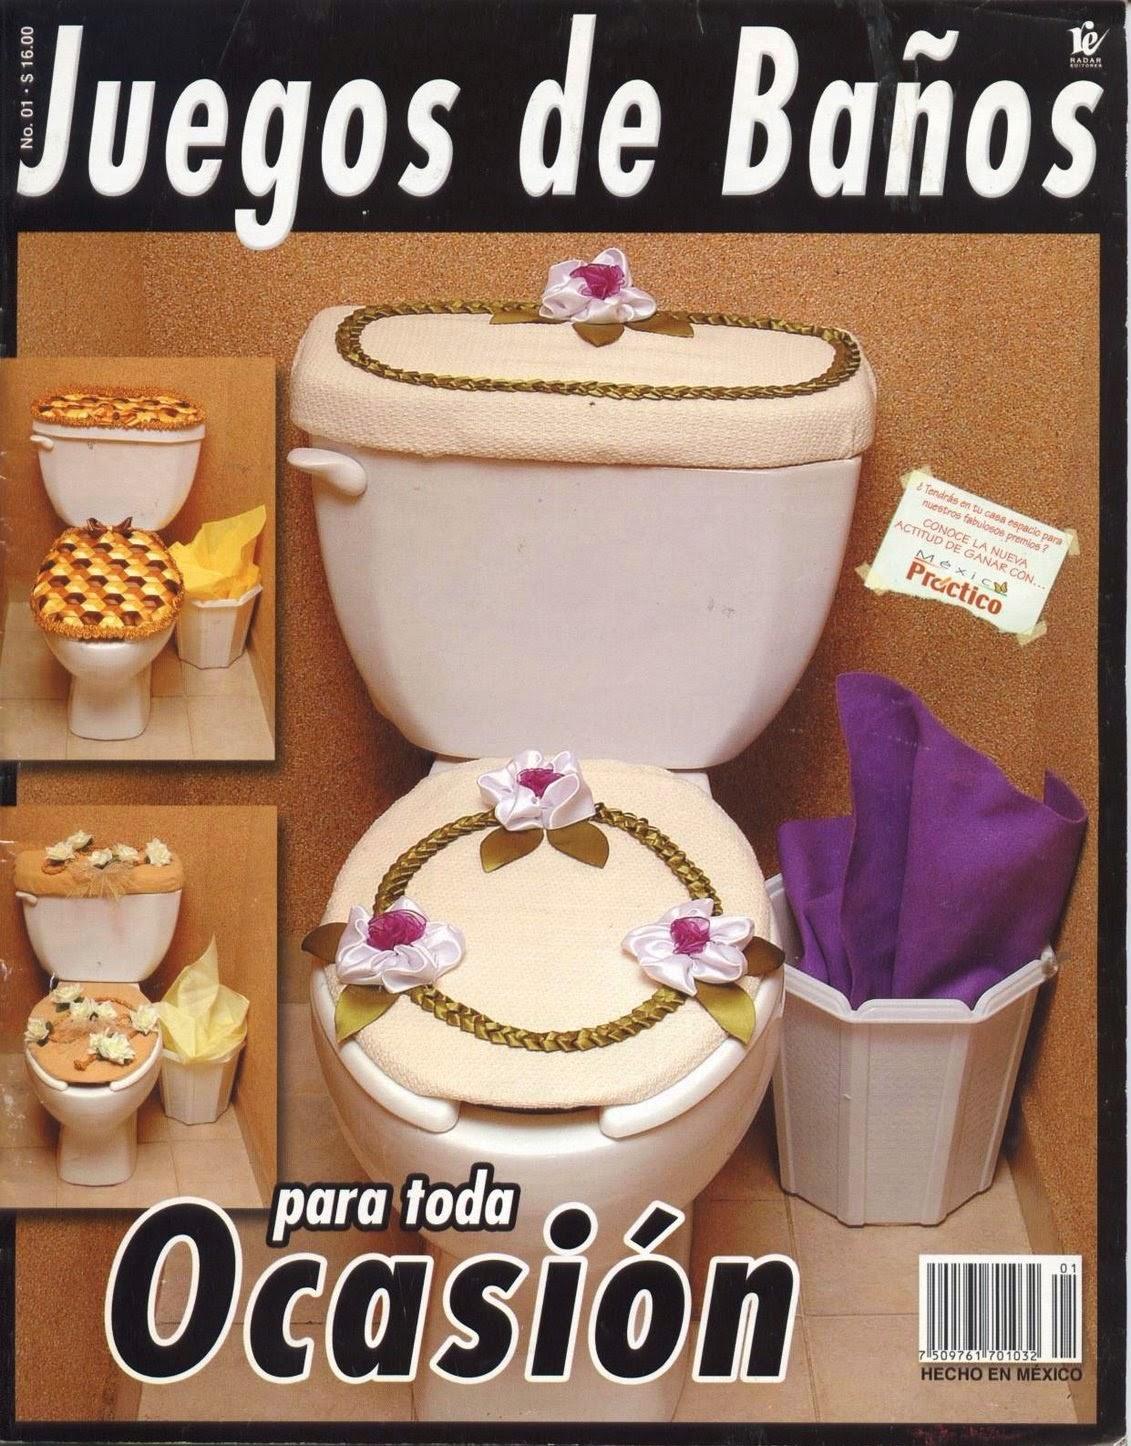 Lenceria De Baño En Crochet:Como hacer juegos de baño – Revistas de manualidades Gratis